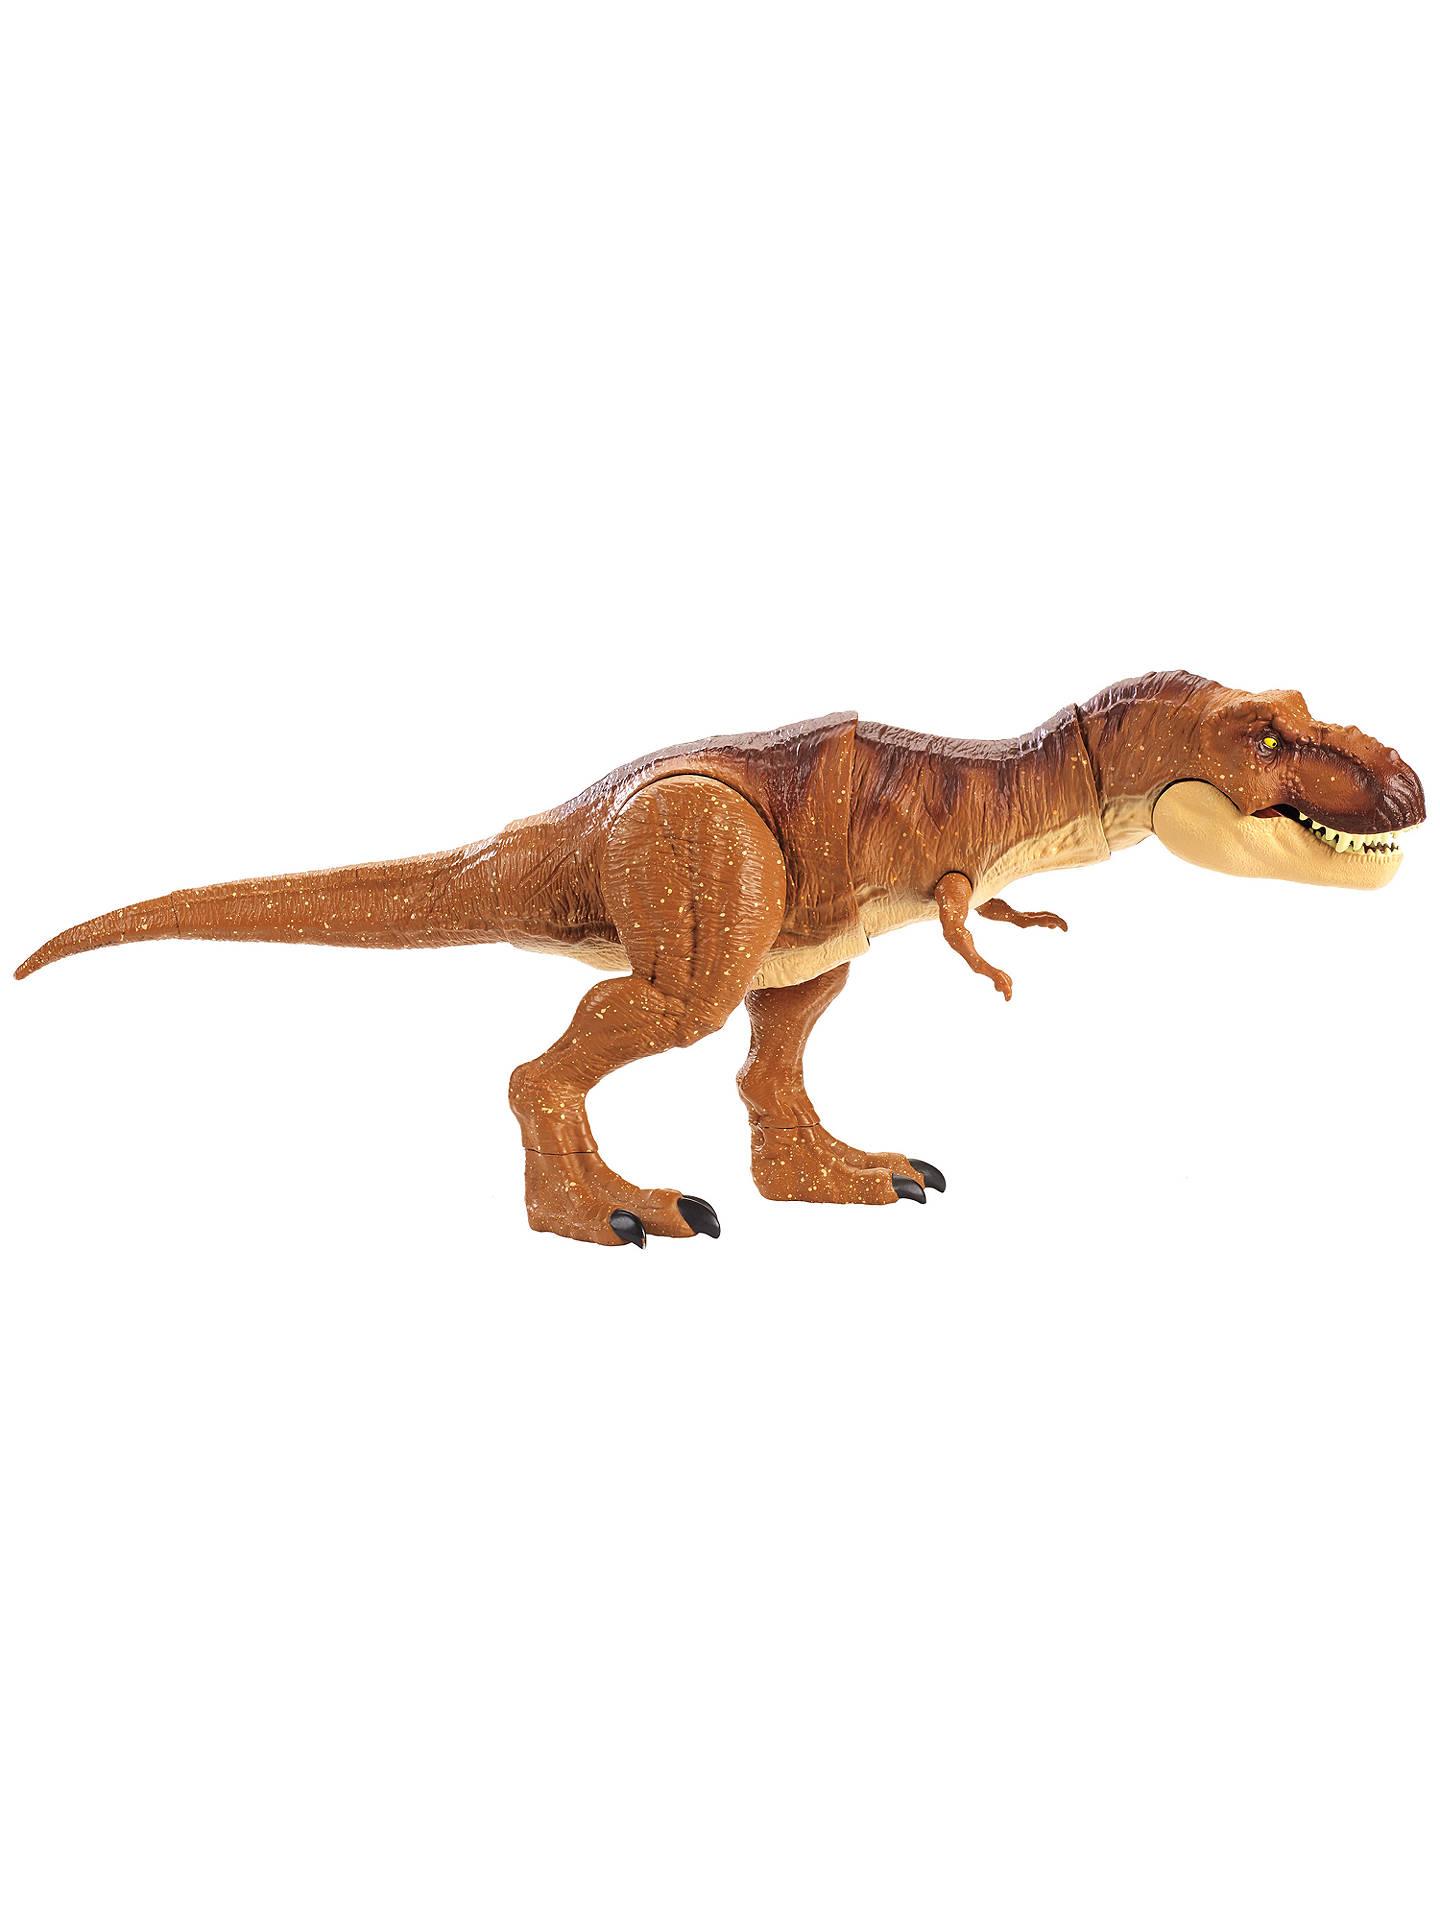 d048b5ca90d5 ... Buy Jurassic World Thrash N Throw T-Rex Online at johnlewis.com ...